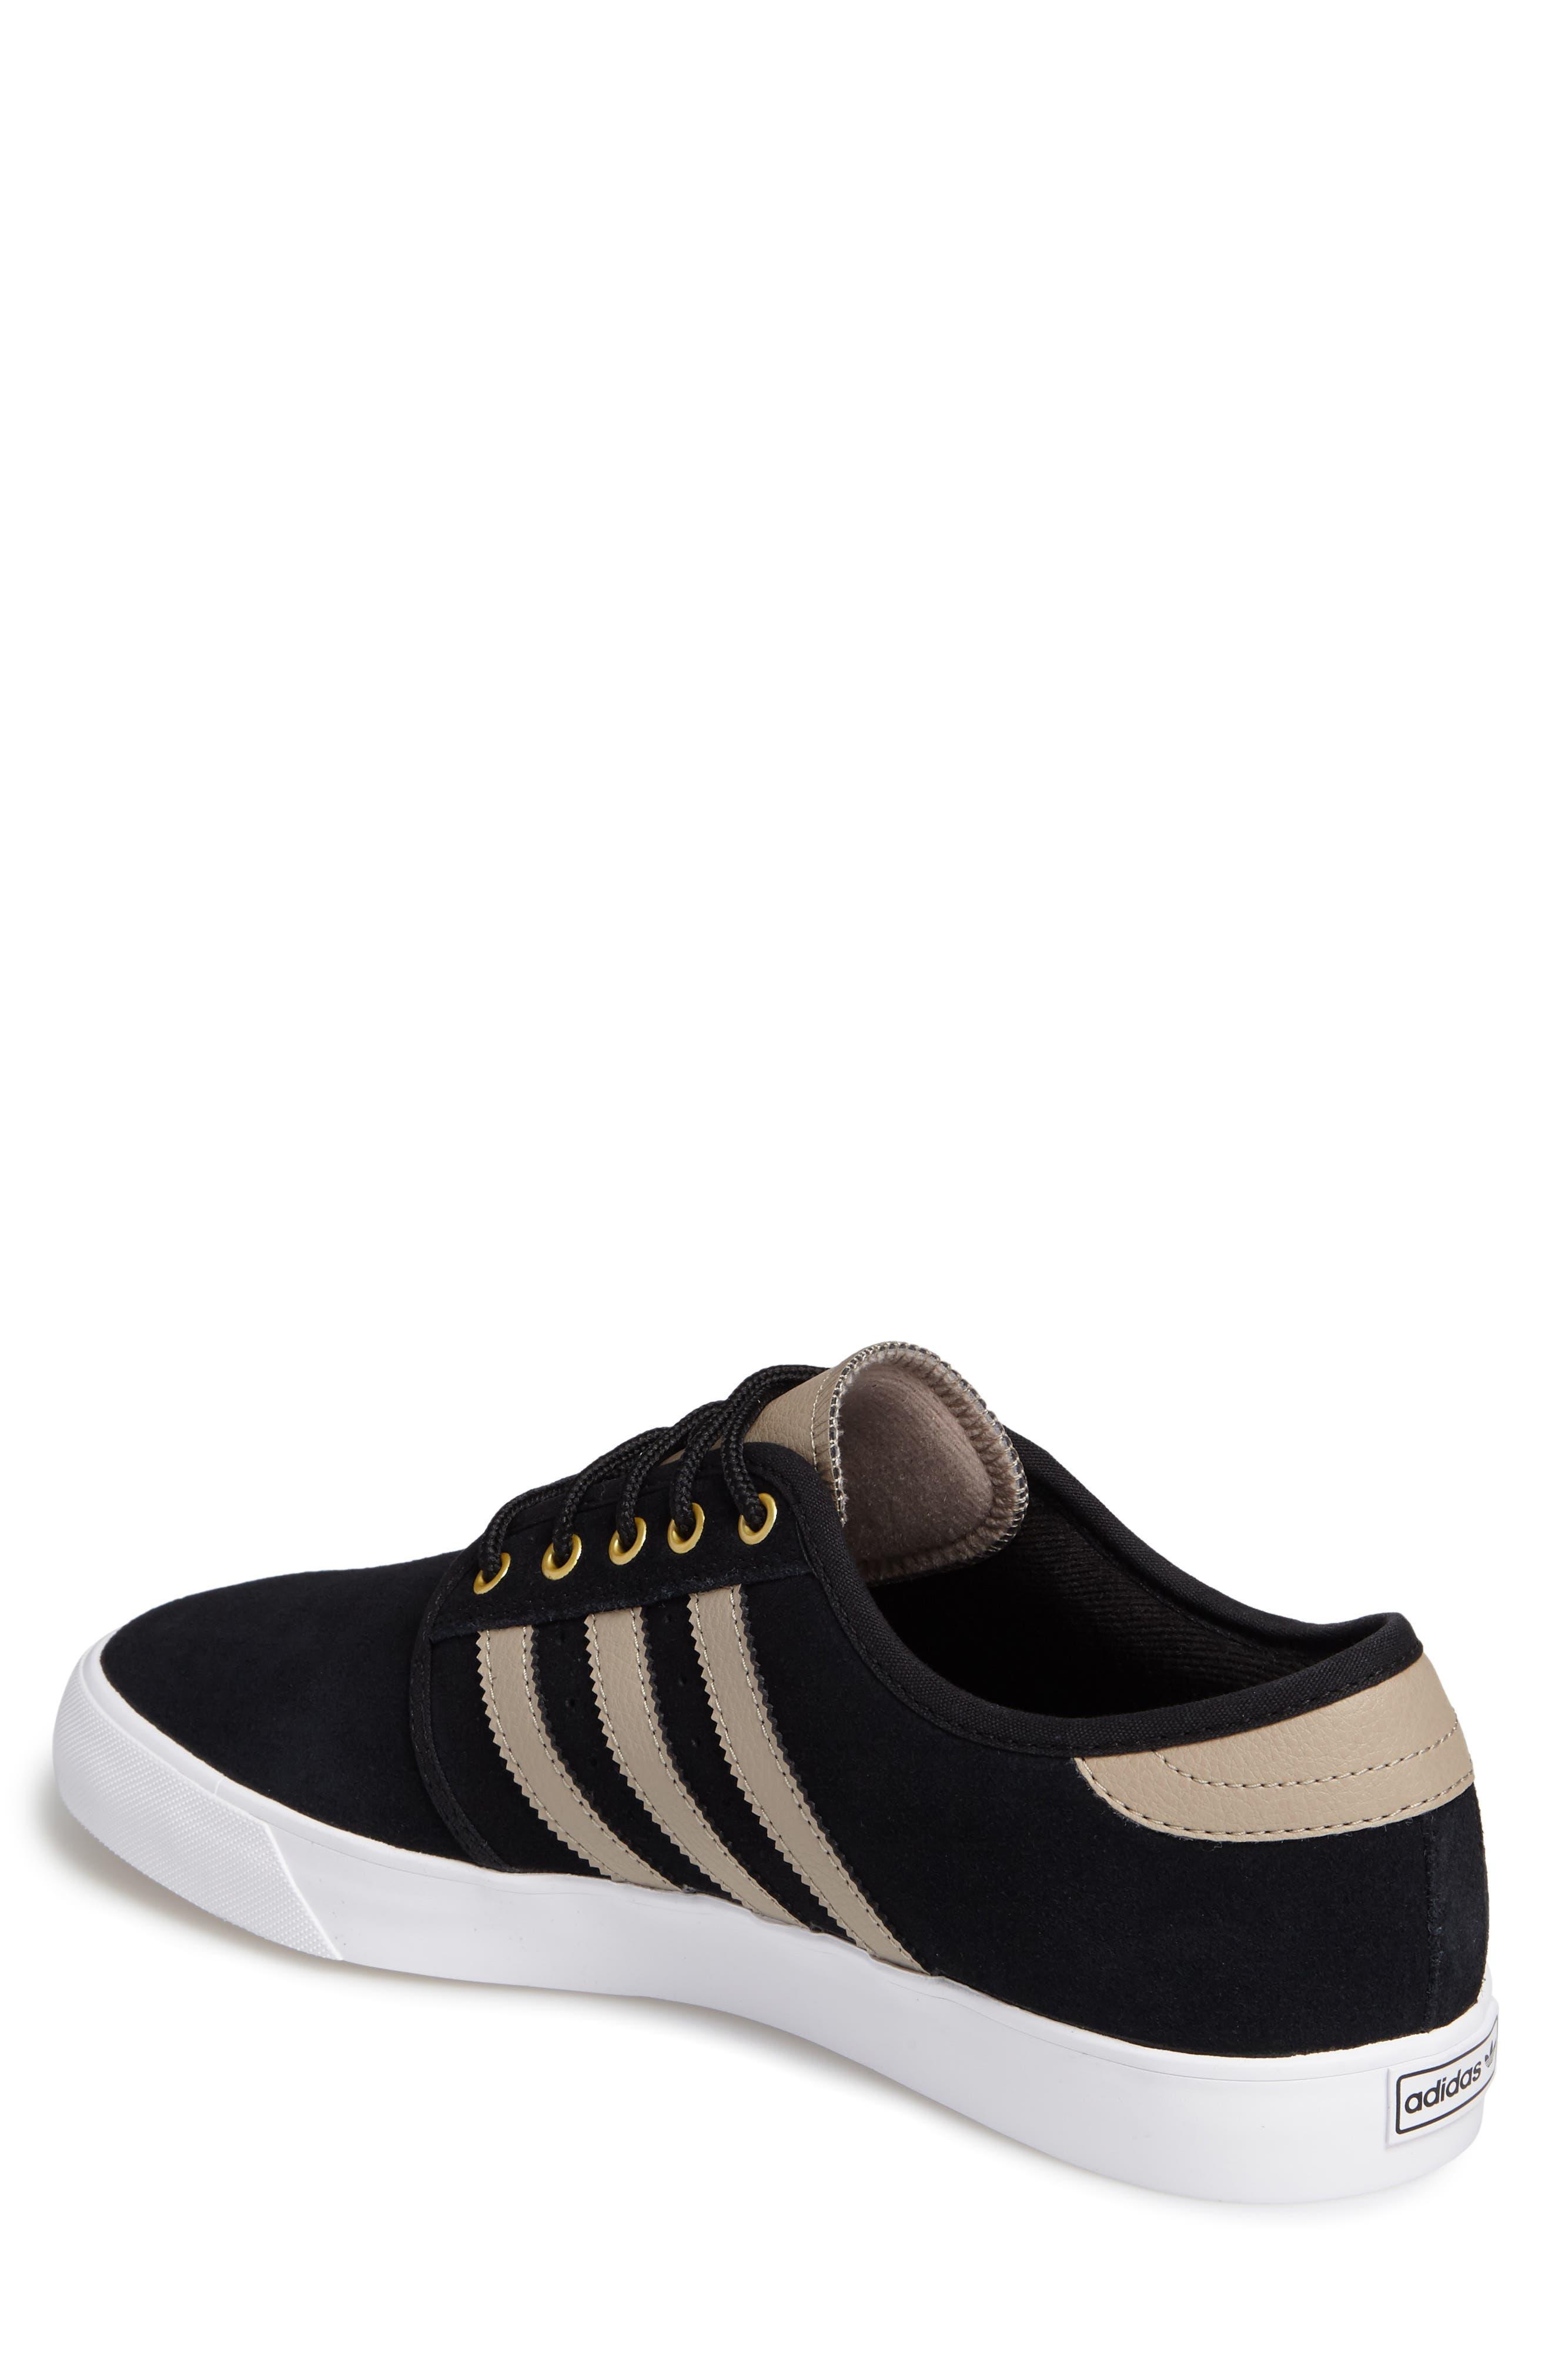 Alternate Image 2  - adidas 'Seeley' Skate Sneaker (Men)